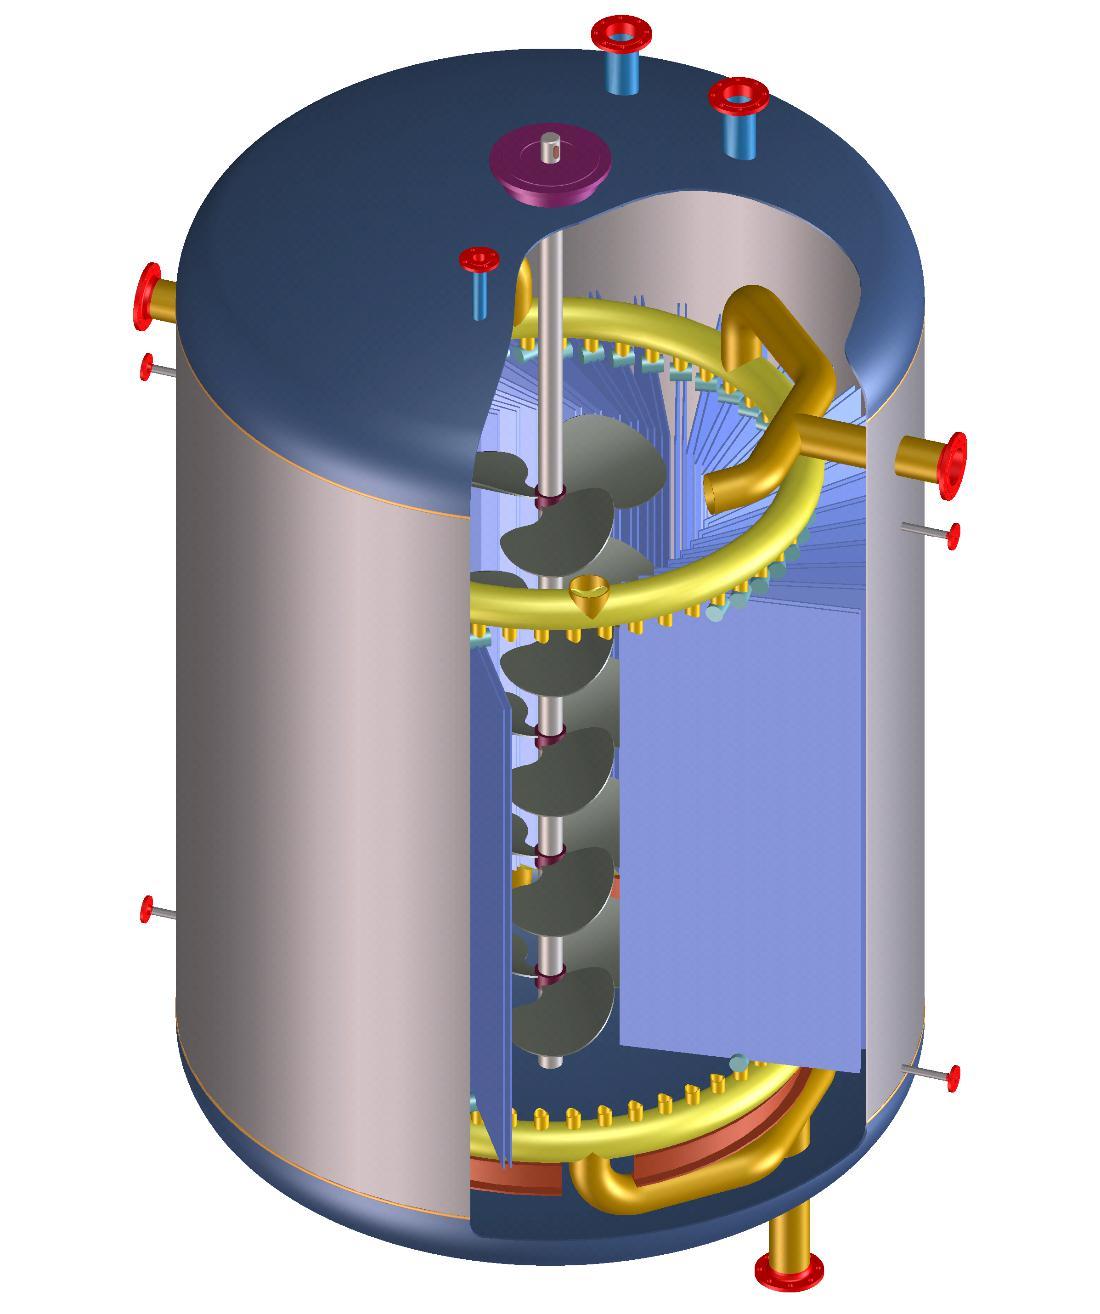 Platten-reaktor